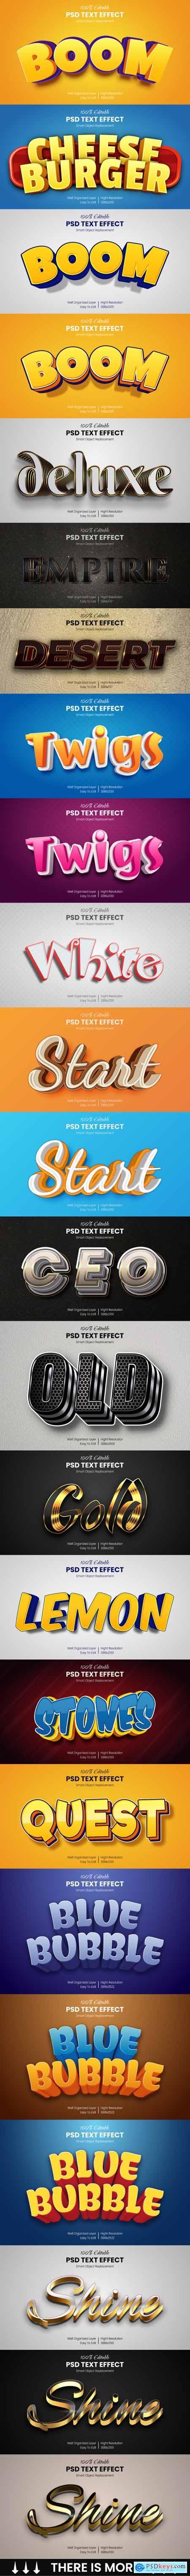 40 Luxury & Cartoon Photoshop Text Effects - Golden & Comic Styles 29800611